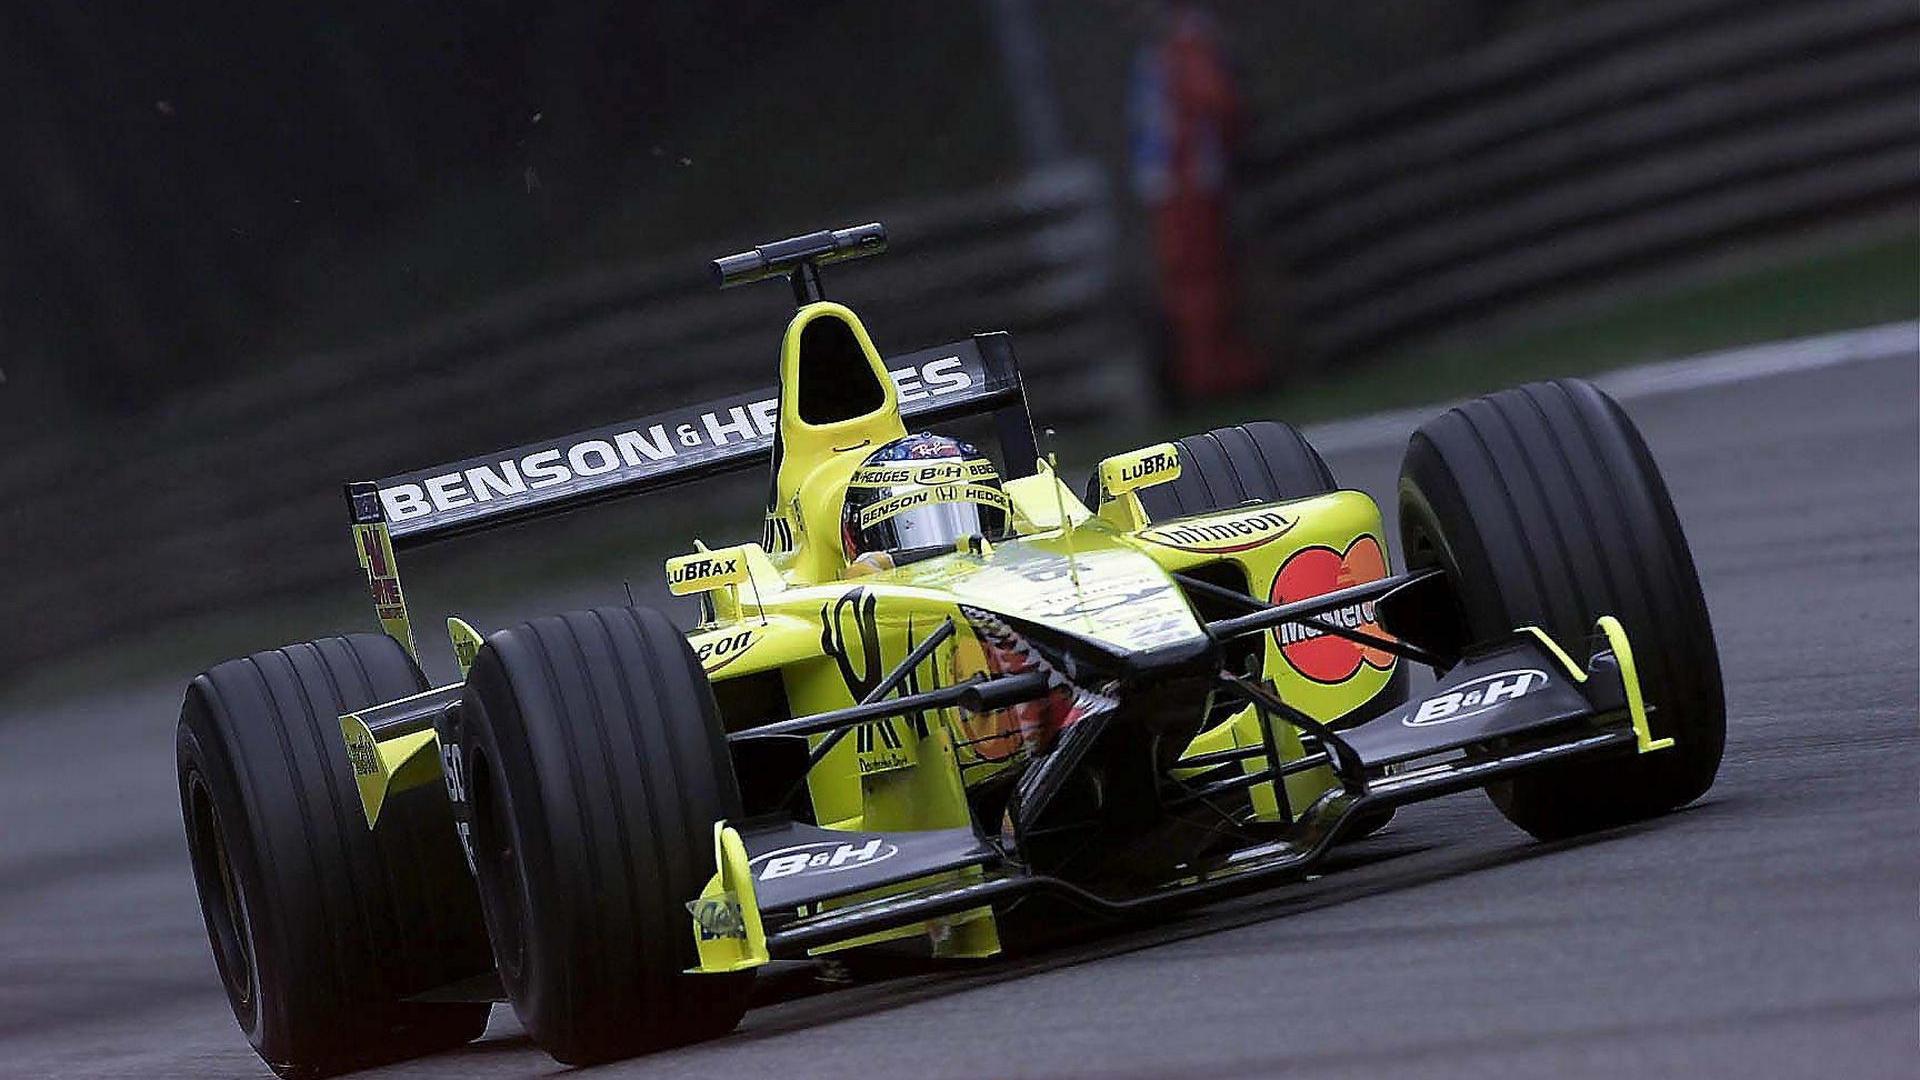 HD Wallpapers 2001 Formula 1 Grand Prix Of Italy F1